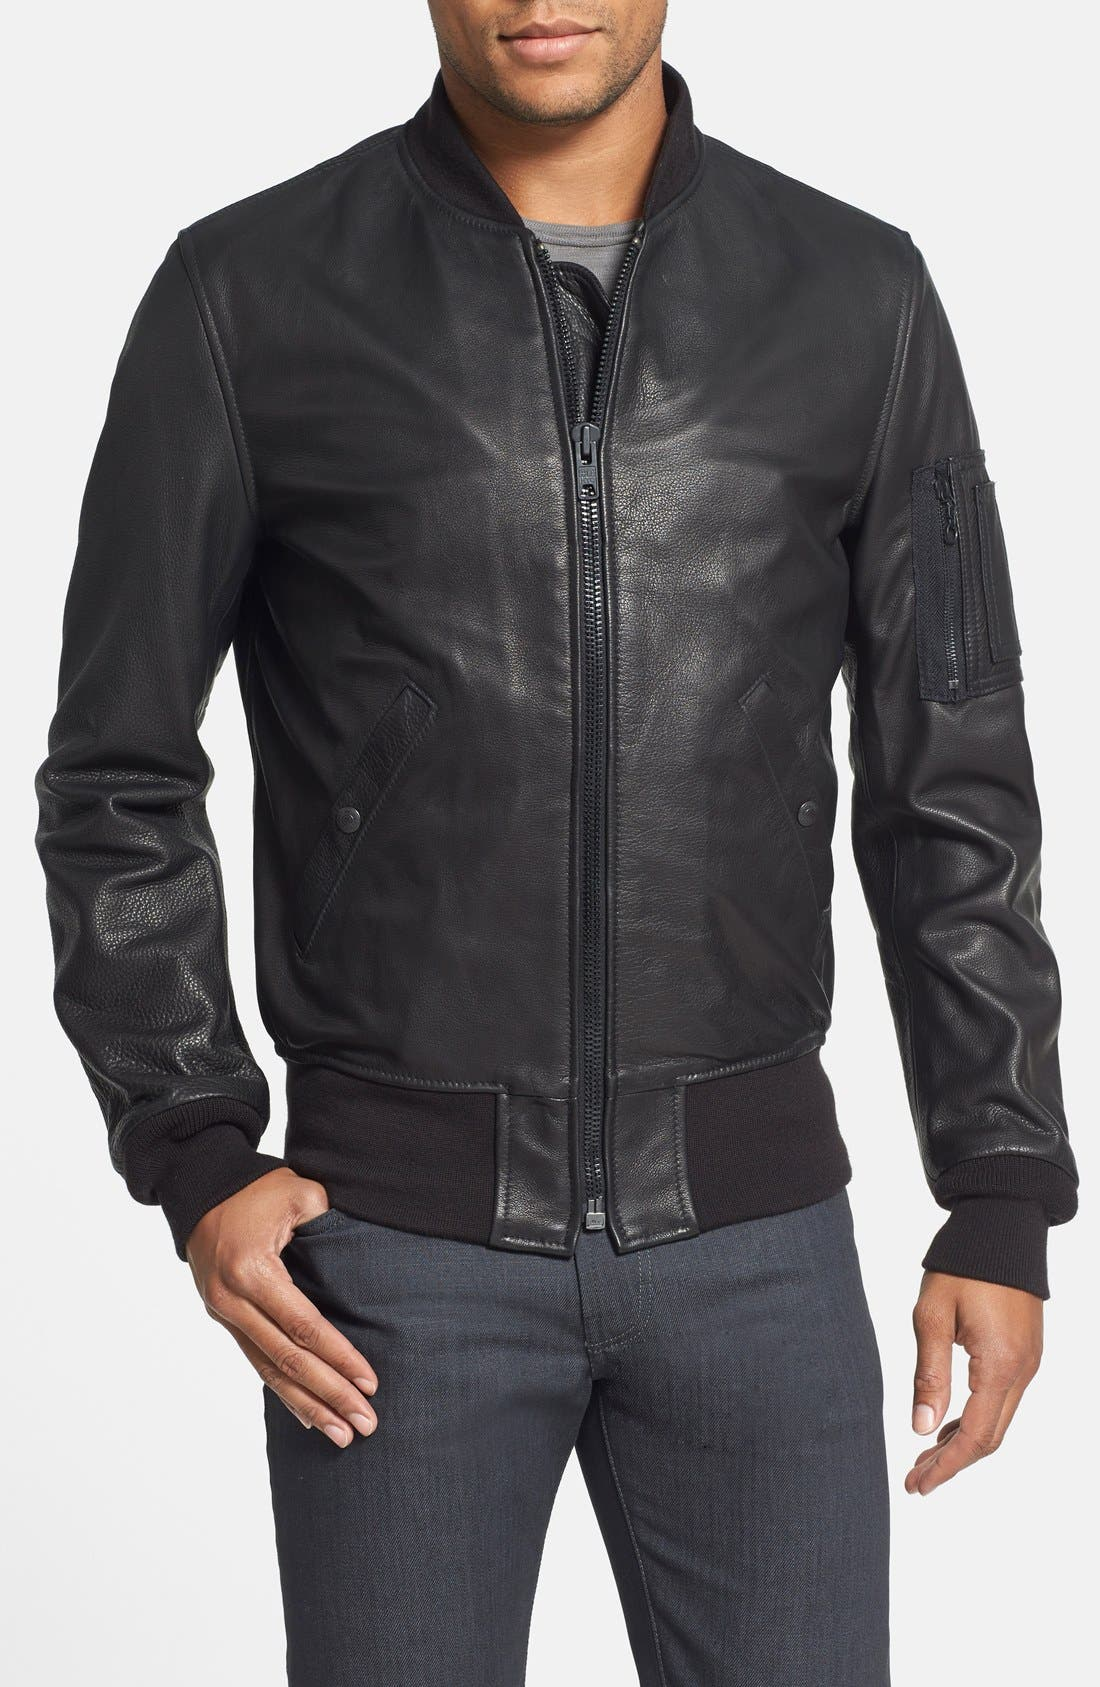 'MA-1' Slim Fit Leather Jacket,                         Main,                         color, Black